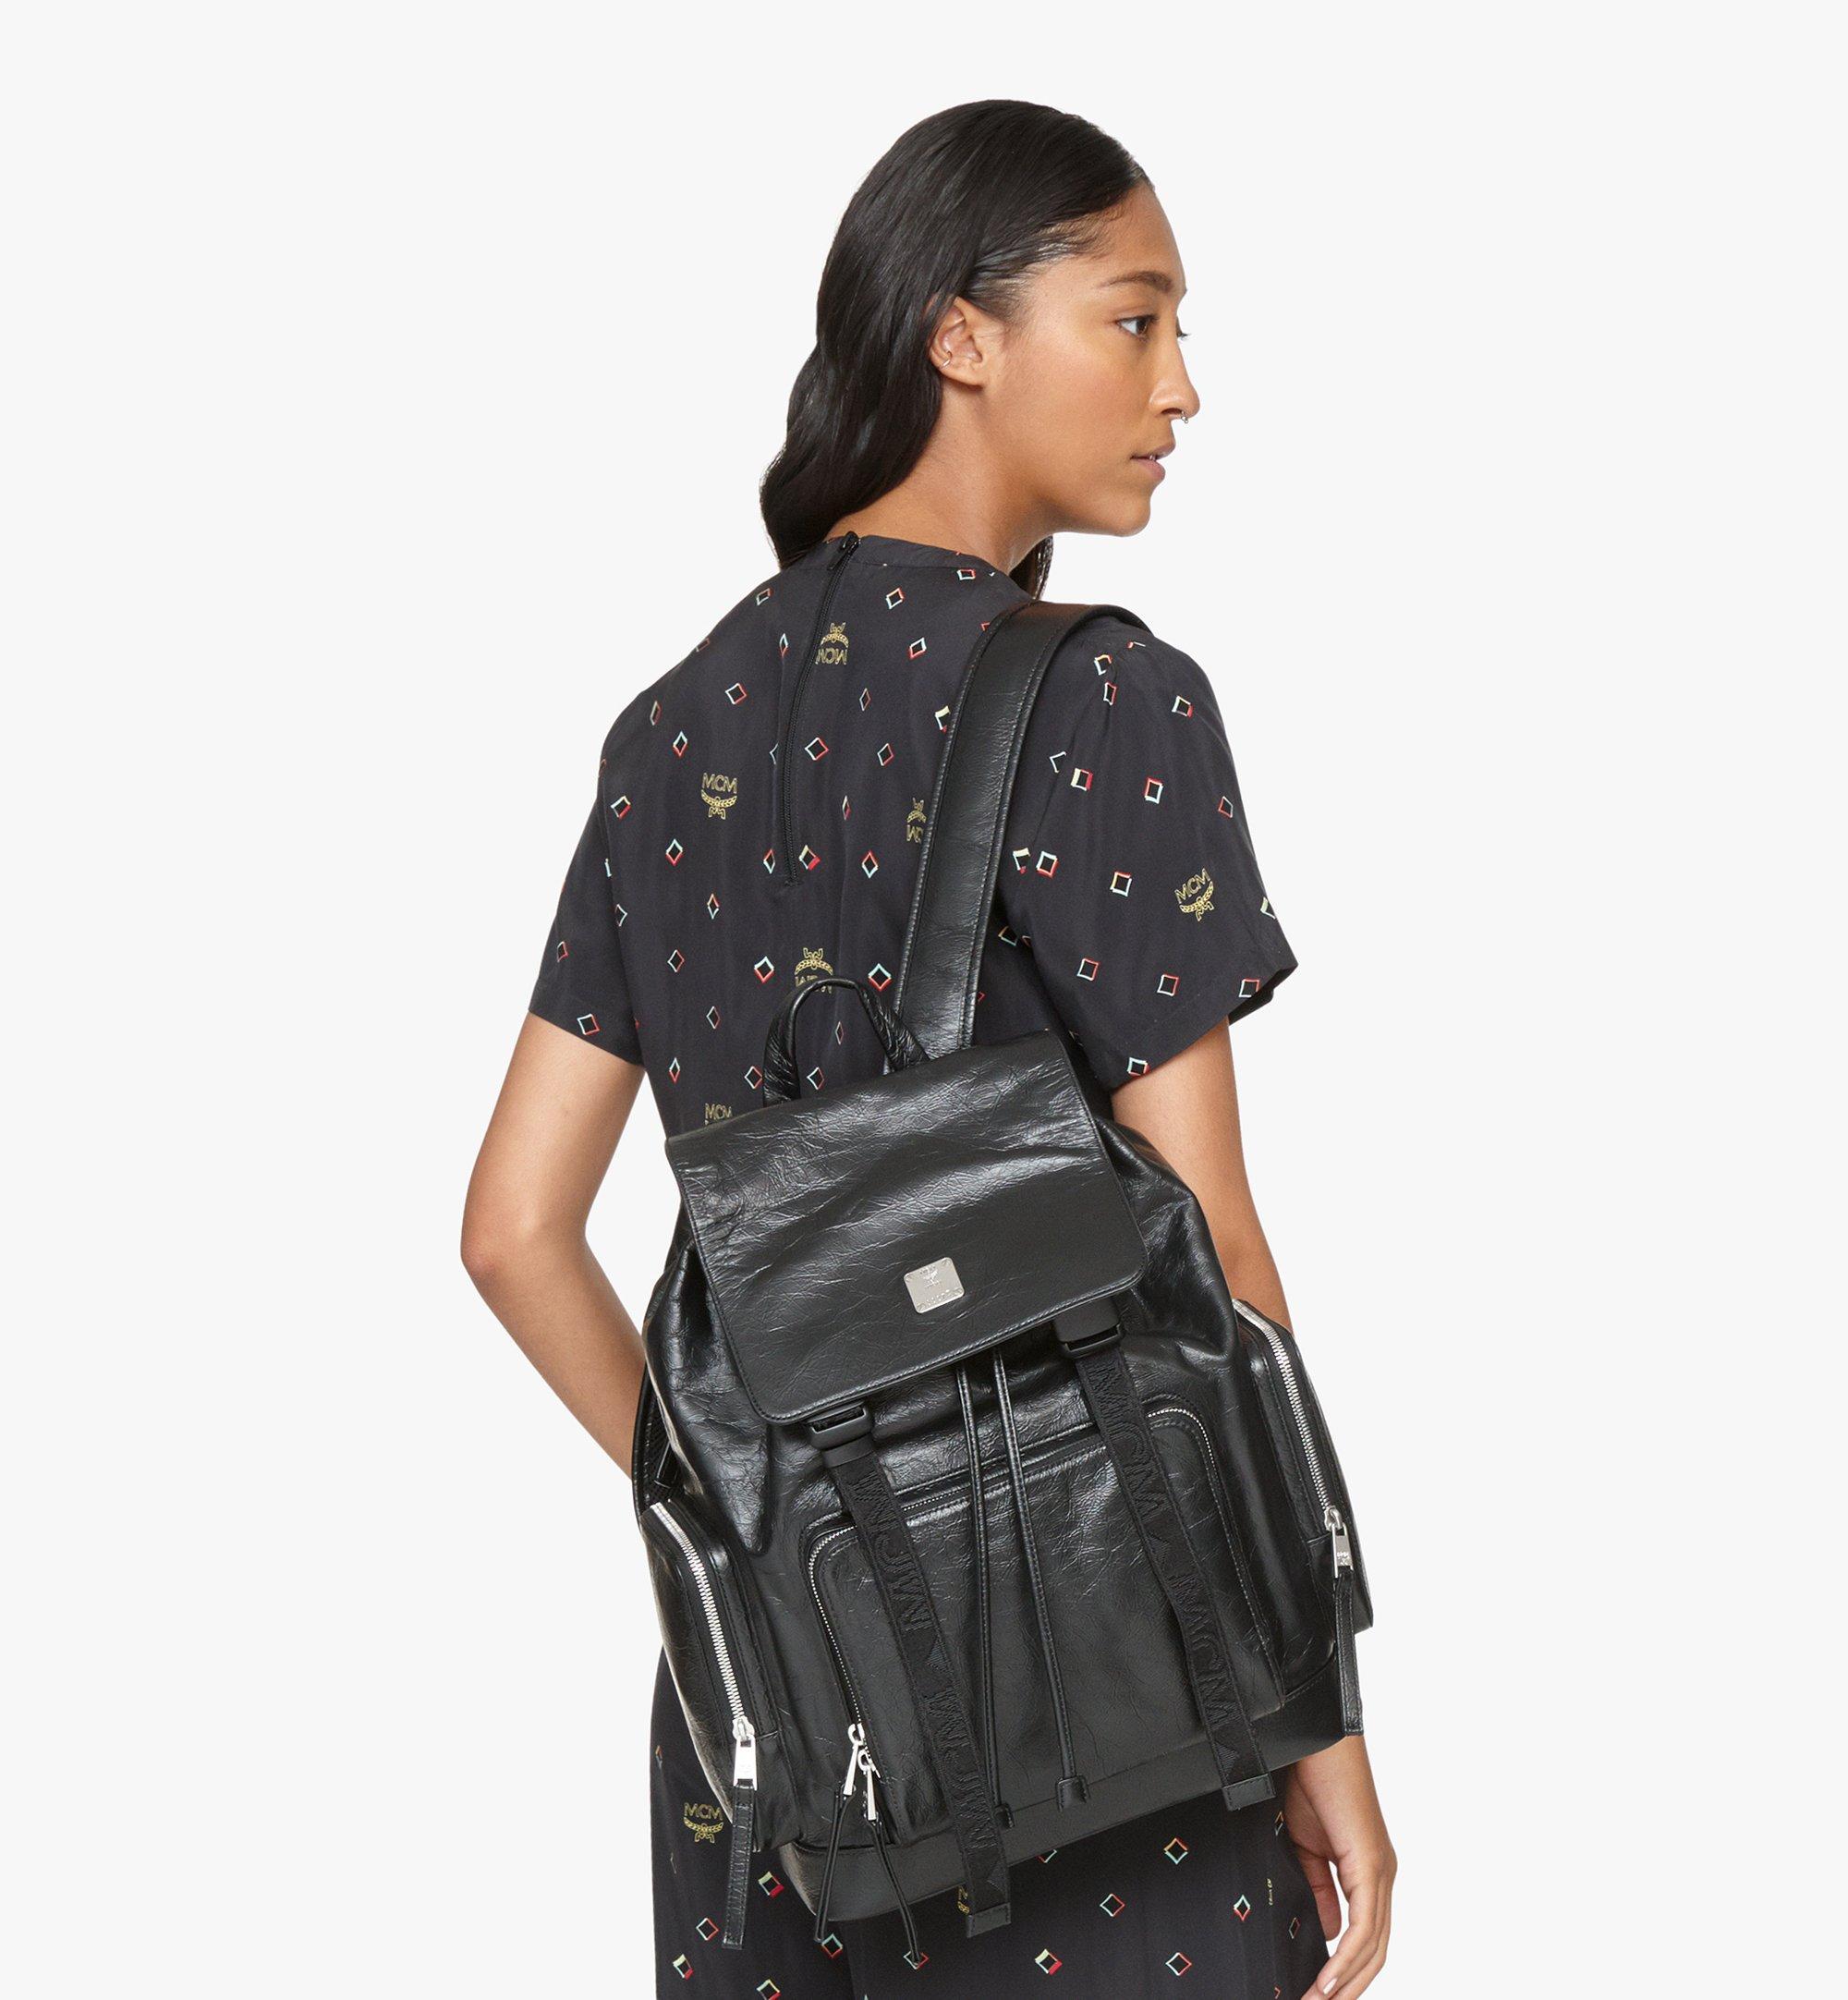 MCM Brandenburg Backpack in Crushed Leather Black MMKASBG02BK001 Alternate View 6